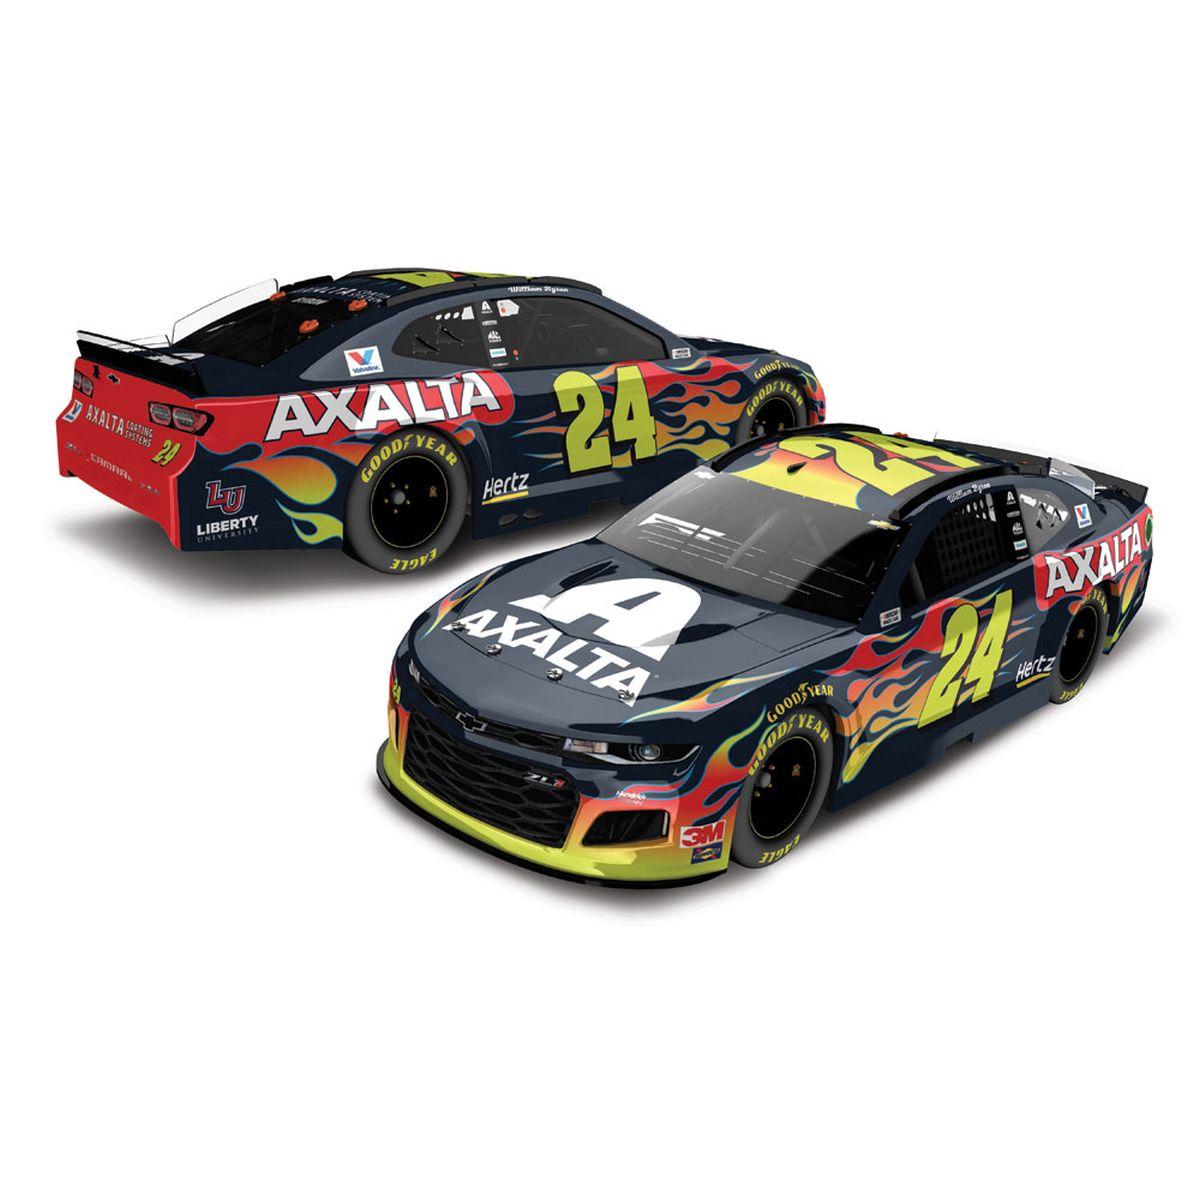 William Byron #24 2020 Axalta NASCAR 1:64 - Die Cast